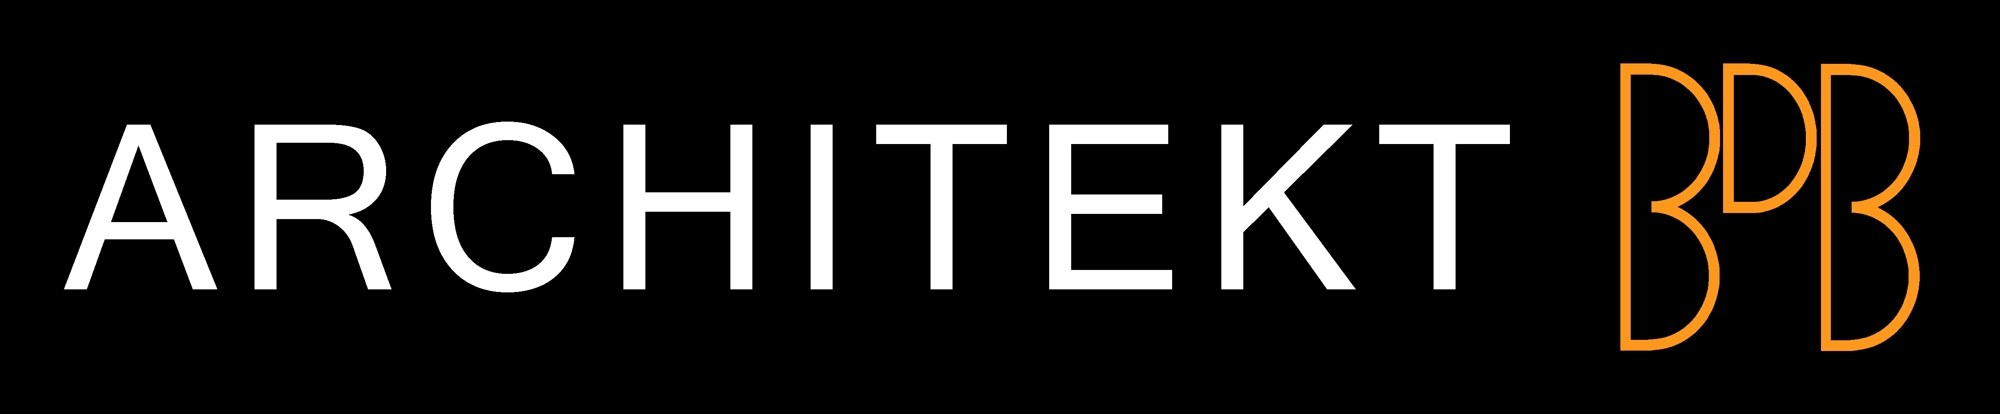 Logo Architekt BDB (schwarz ohne Rahmen,2000x414)